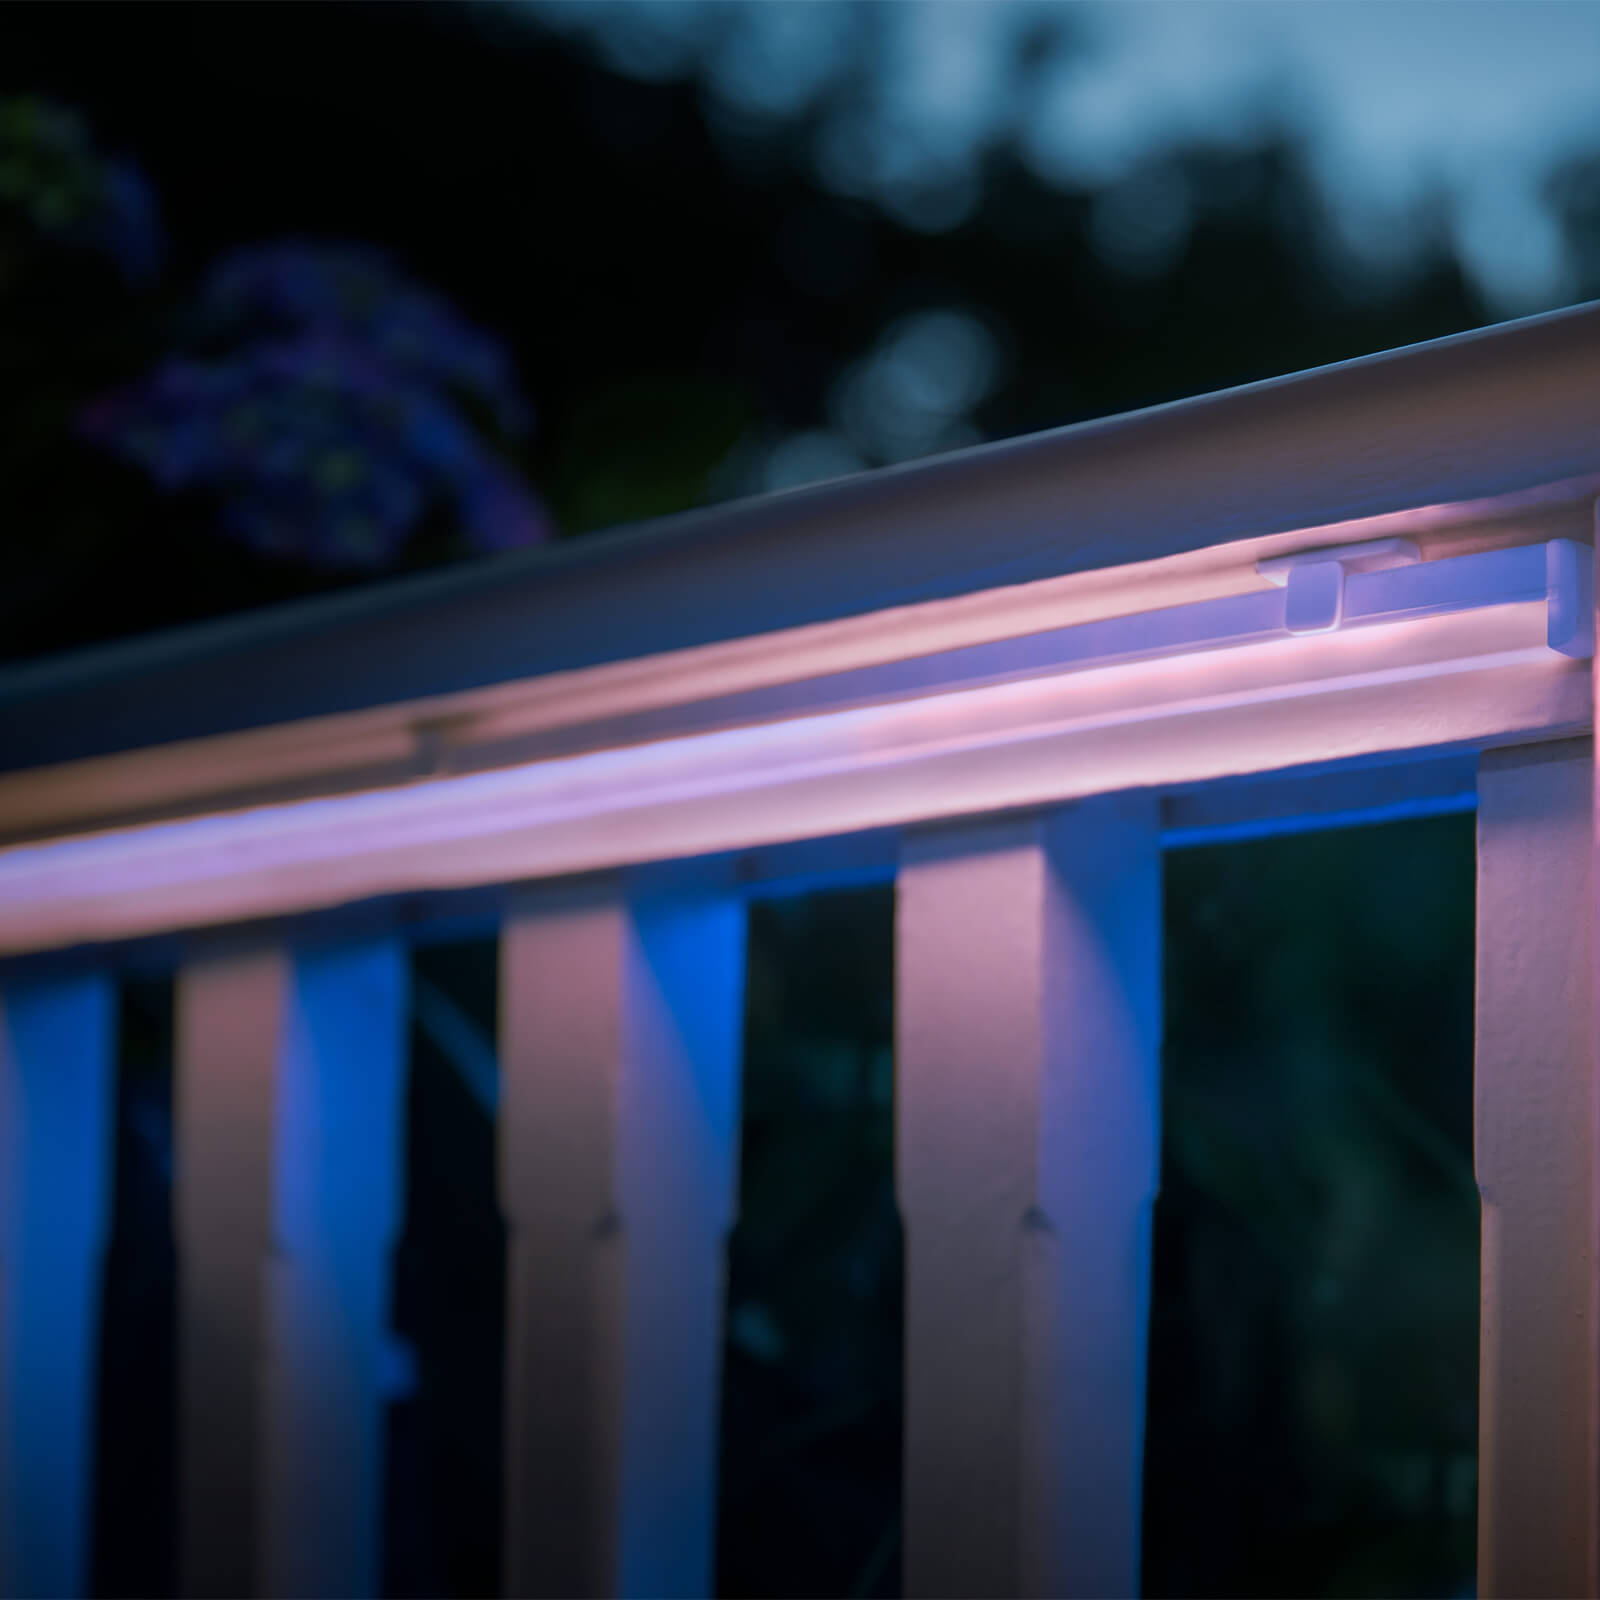 Top Philips Hue Outdoor Lightstrip 2m DH54